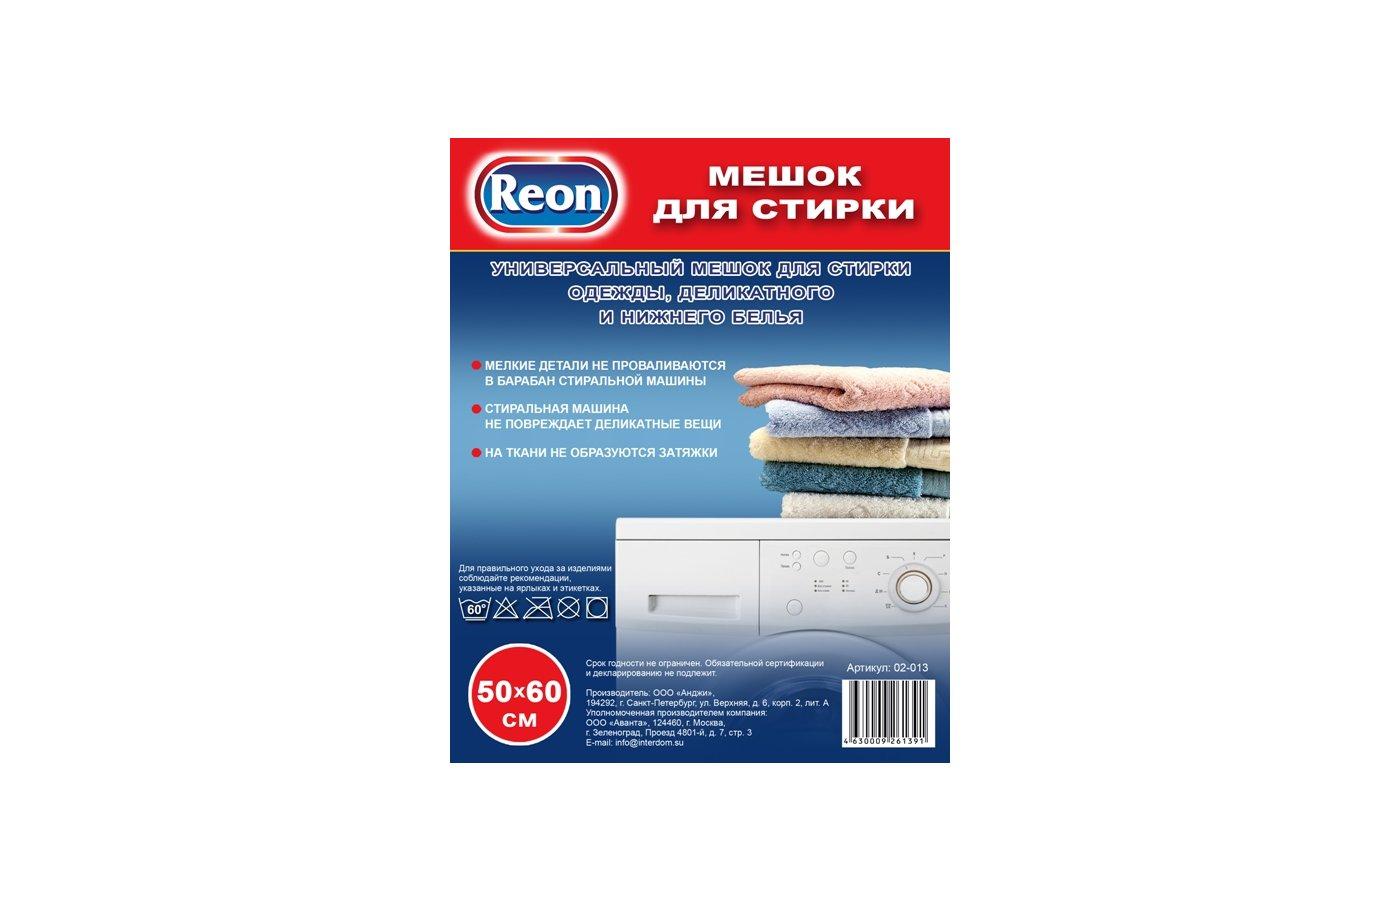 Корзины и контейнеры Reon 02-013 Мешок для стирки размер 50х60